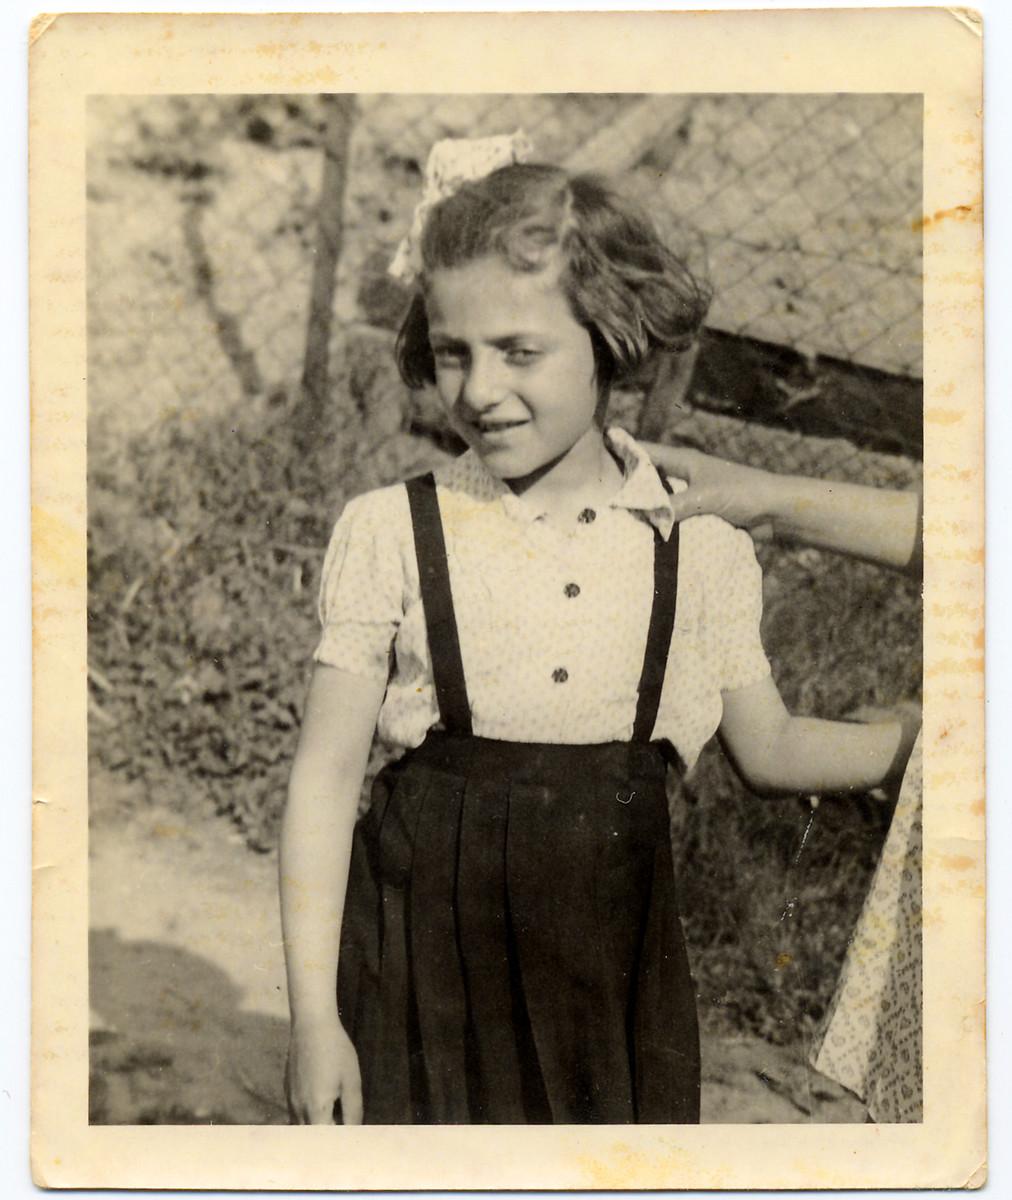 Portrait of Elzbieta Elza Schwarzwald shortly after liberation.